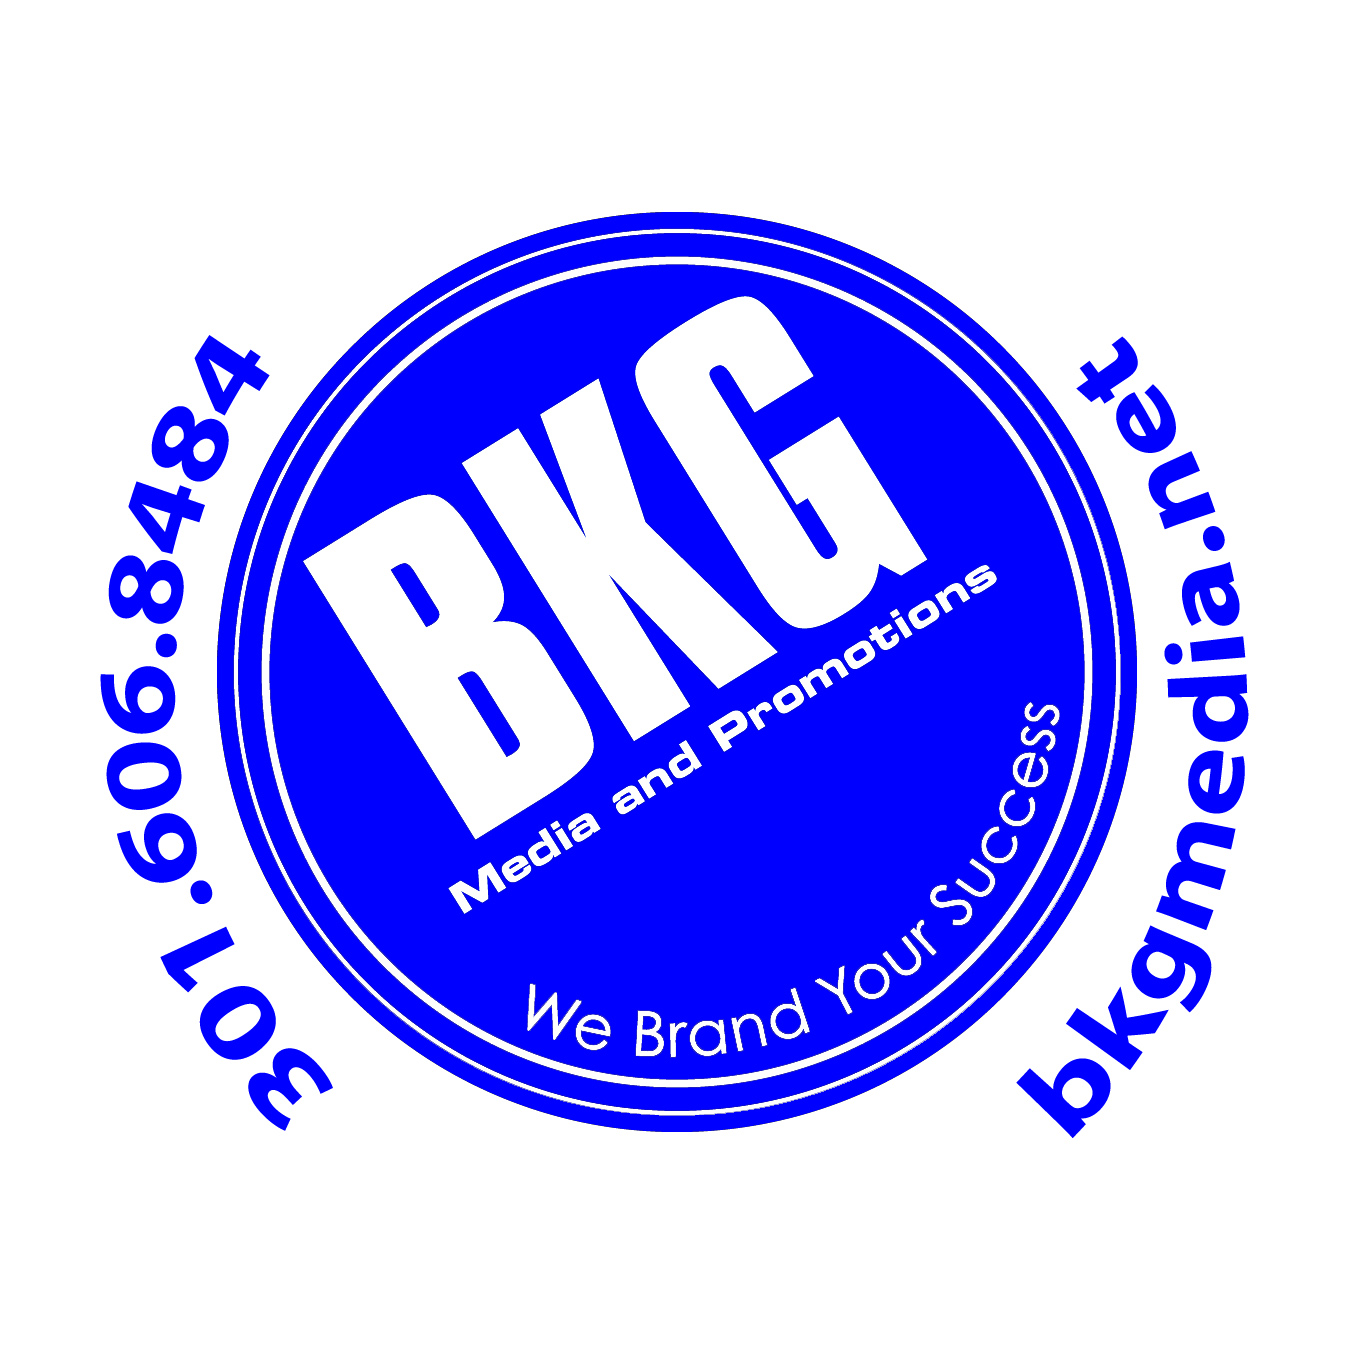 BKG newest logo 2019.jpg